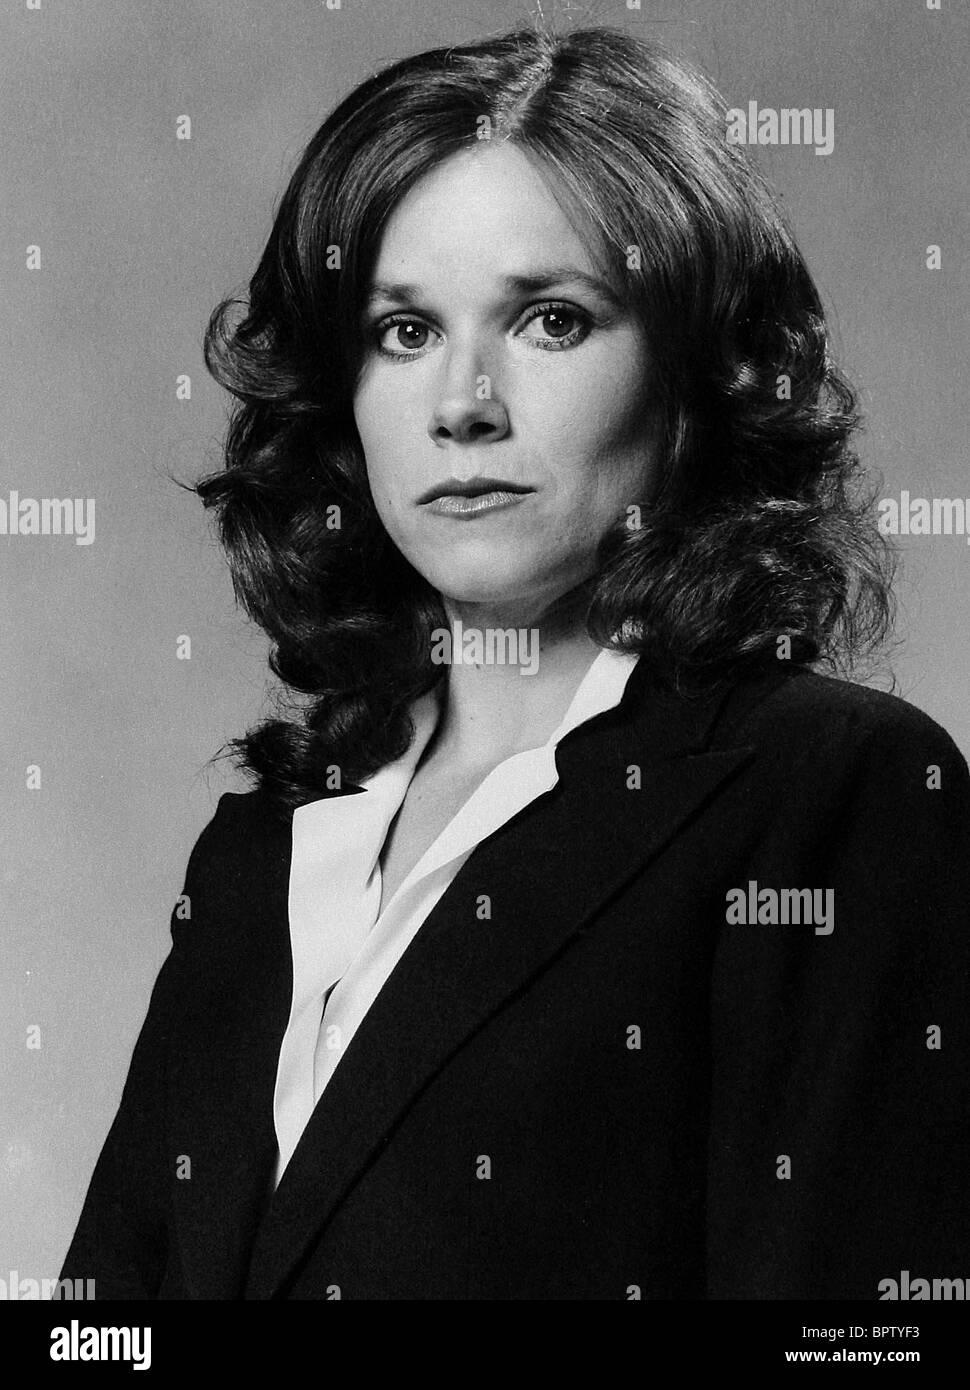 BARBARA HERSHEY ACTRESS (1980) - Stock Image